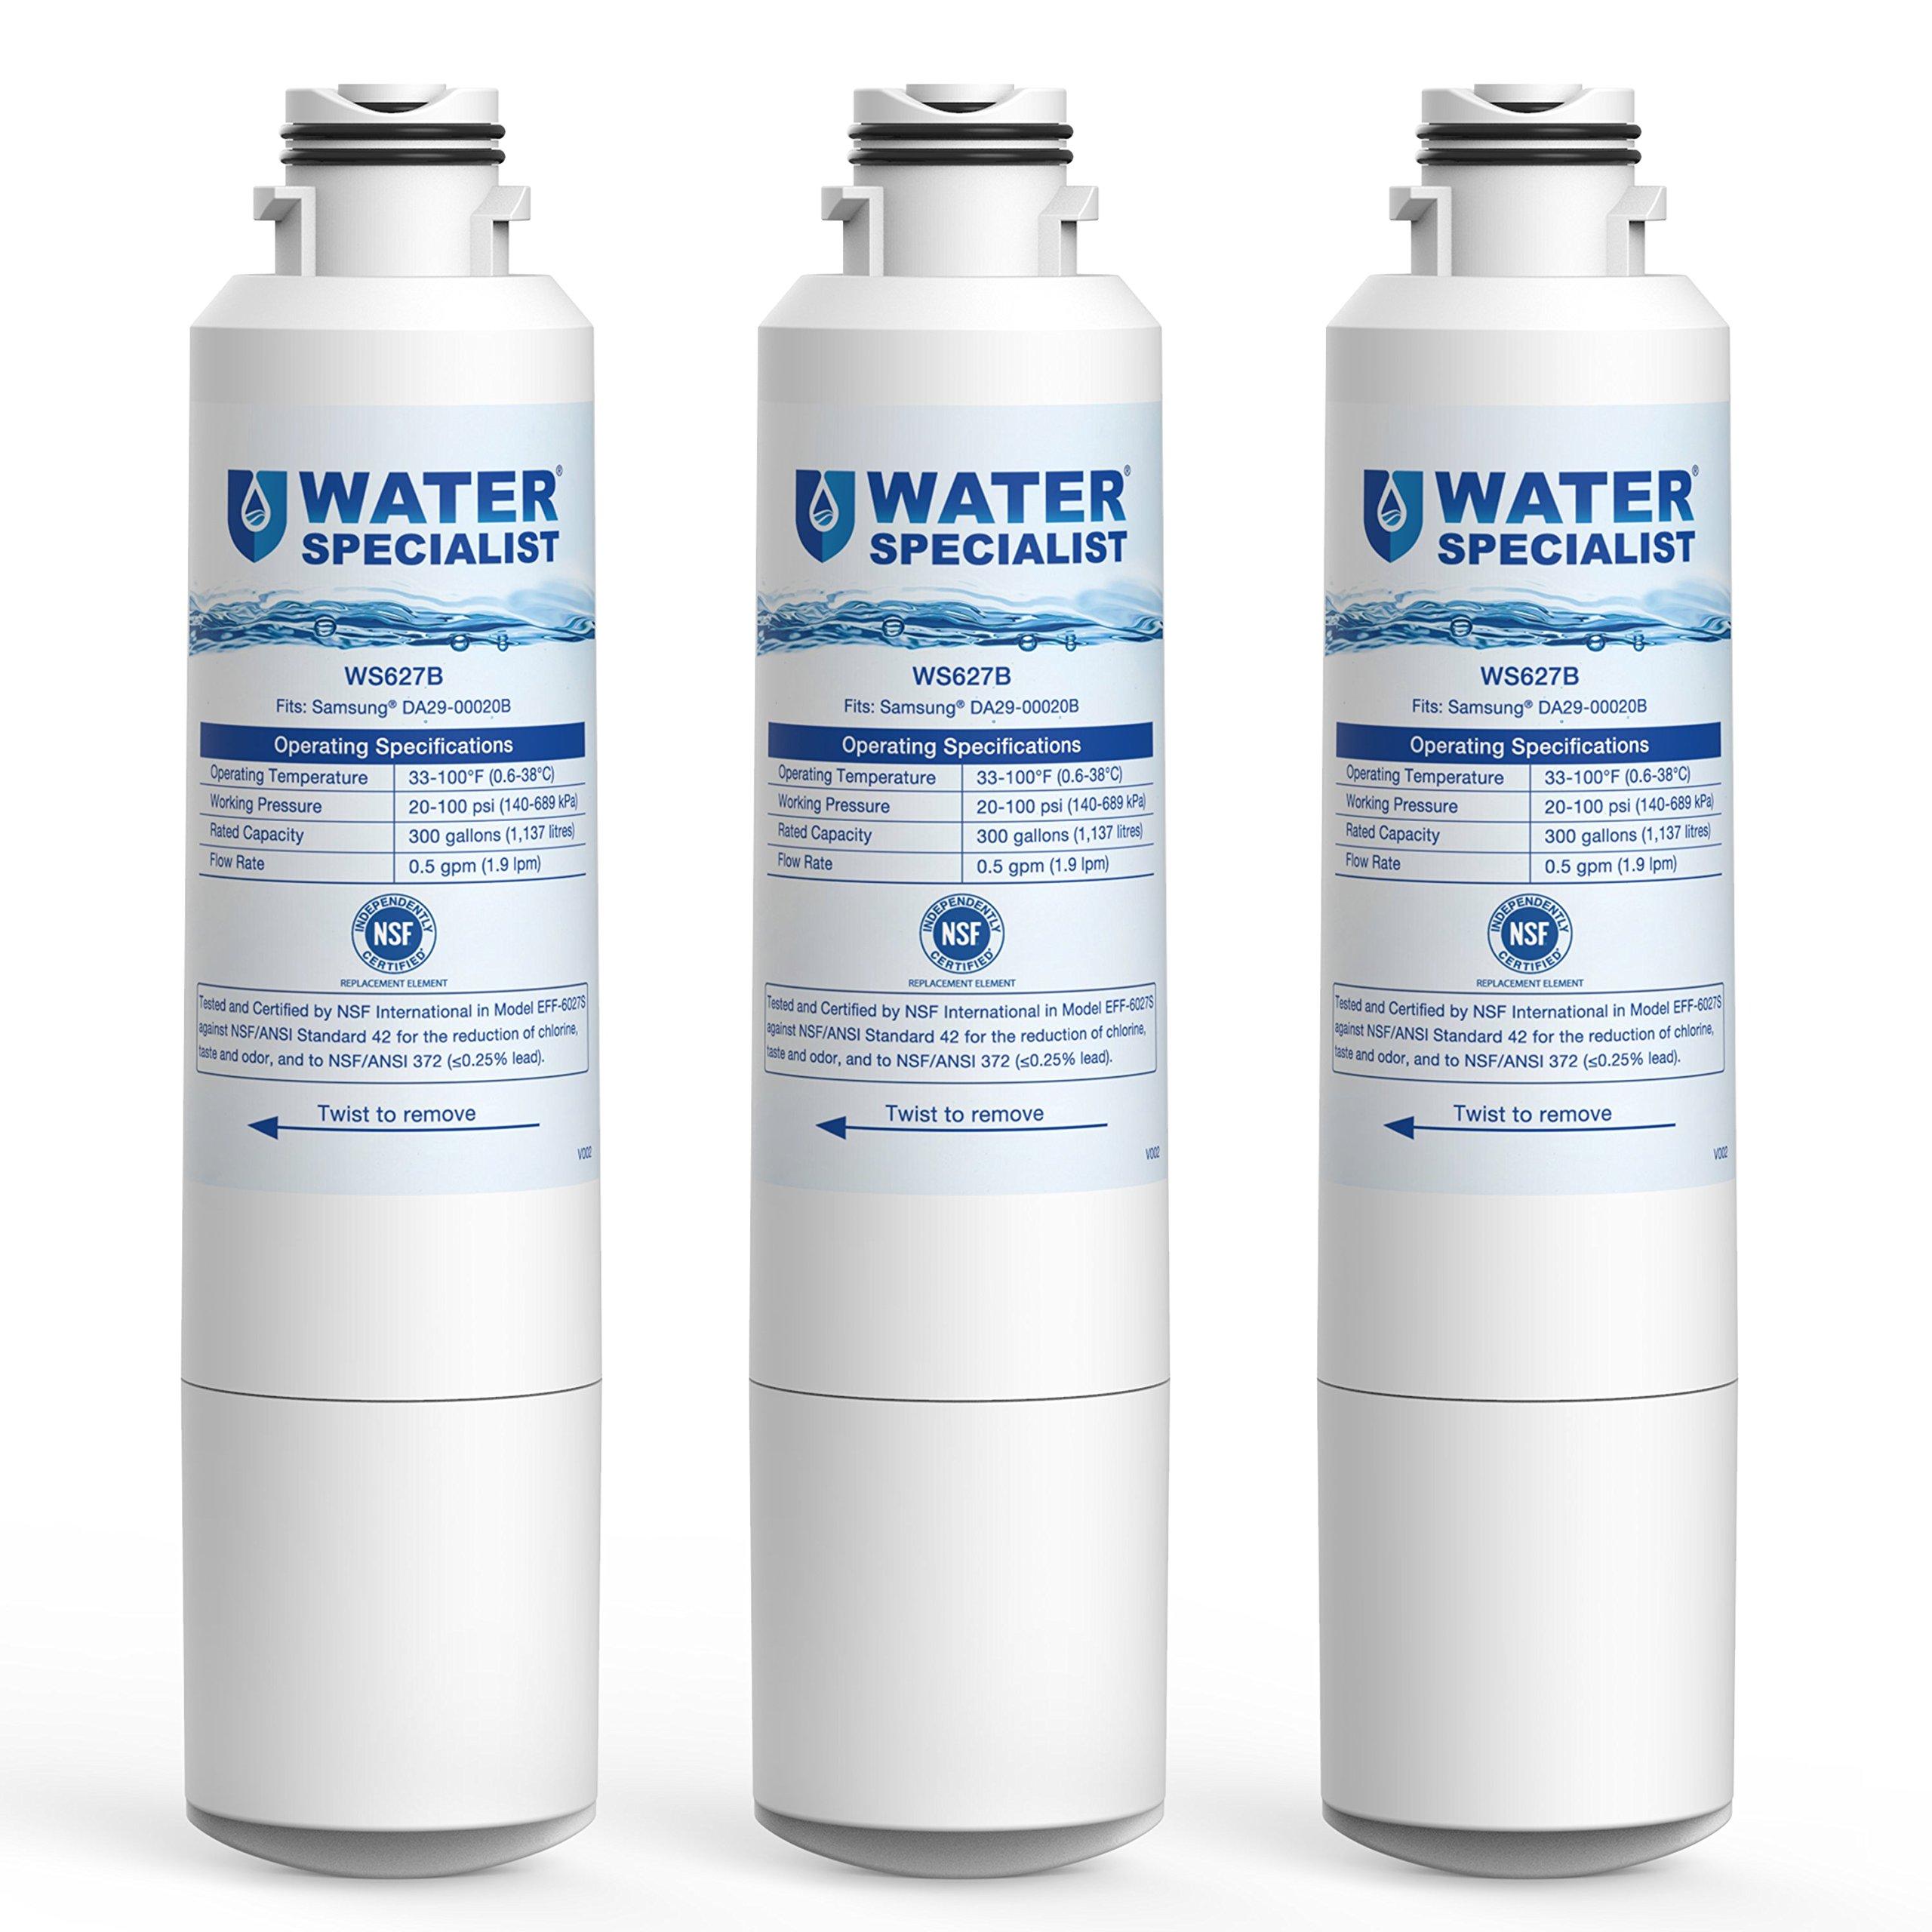 Waterspecialist DA29-00020B Replacement Refrigerator Water Filter, Compatible with Samsung HAF-CIN, HAF-CIN/EXP, DA29-00020A/B, DA97-08006A, RF28HMEDBSR, RF4287HARS, RF263TEAESG, RH22H9010SR, 3 Pack